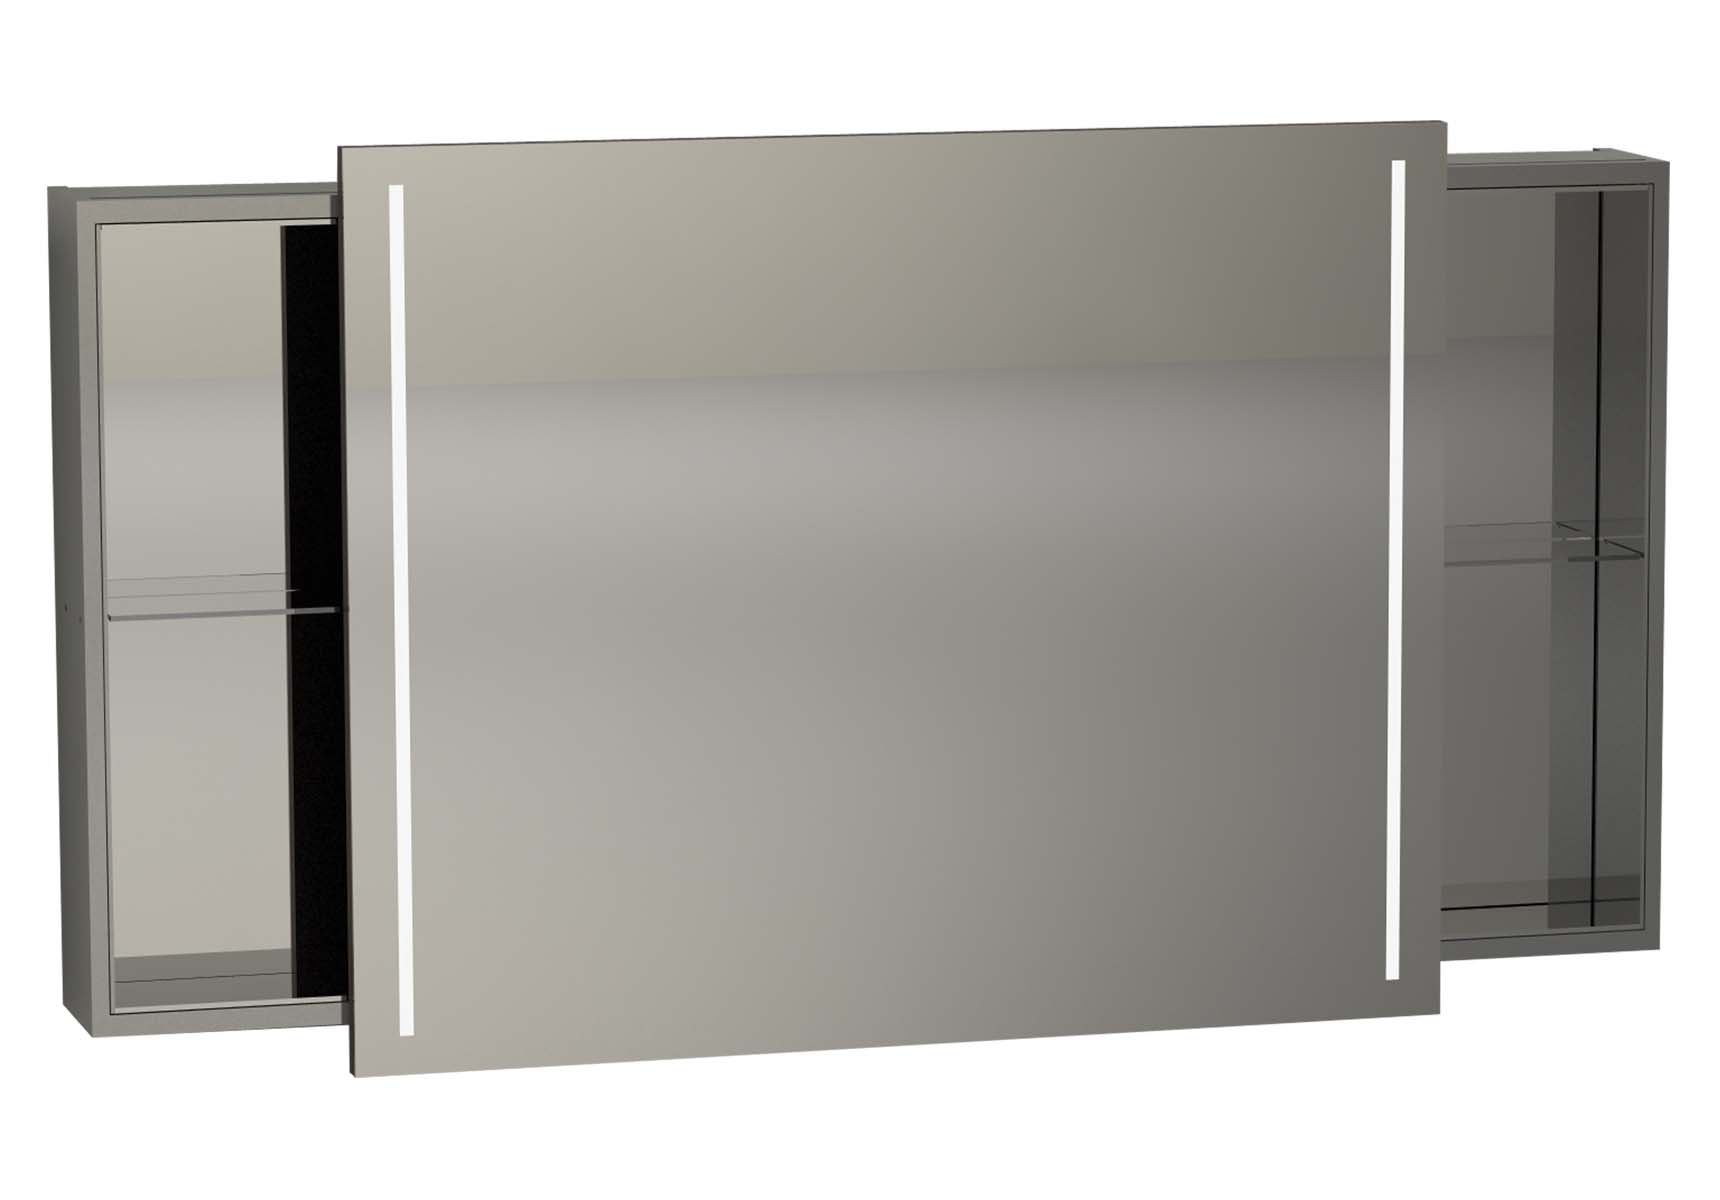 Memoria Illuminated Mirror Cabinet, 120 cm, Grey High Gloss